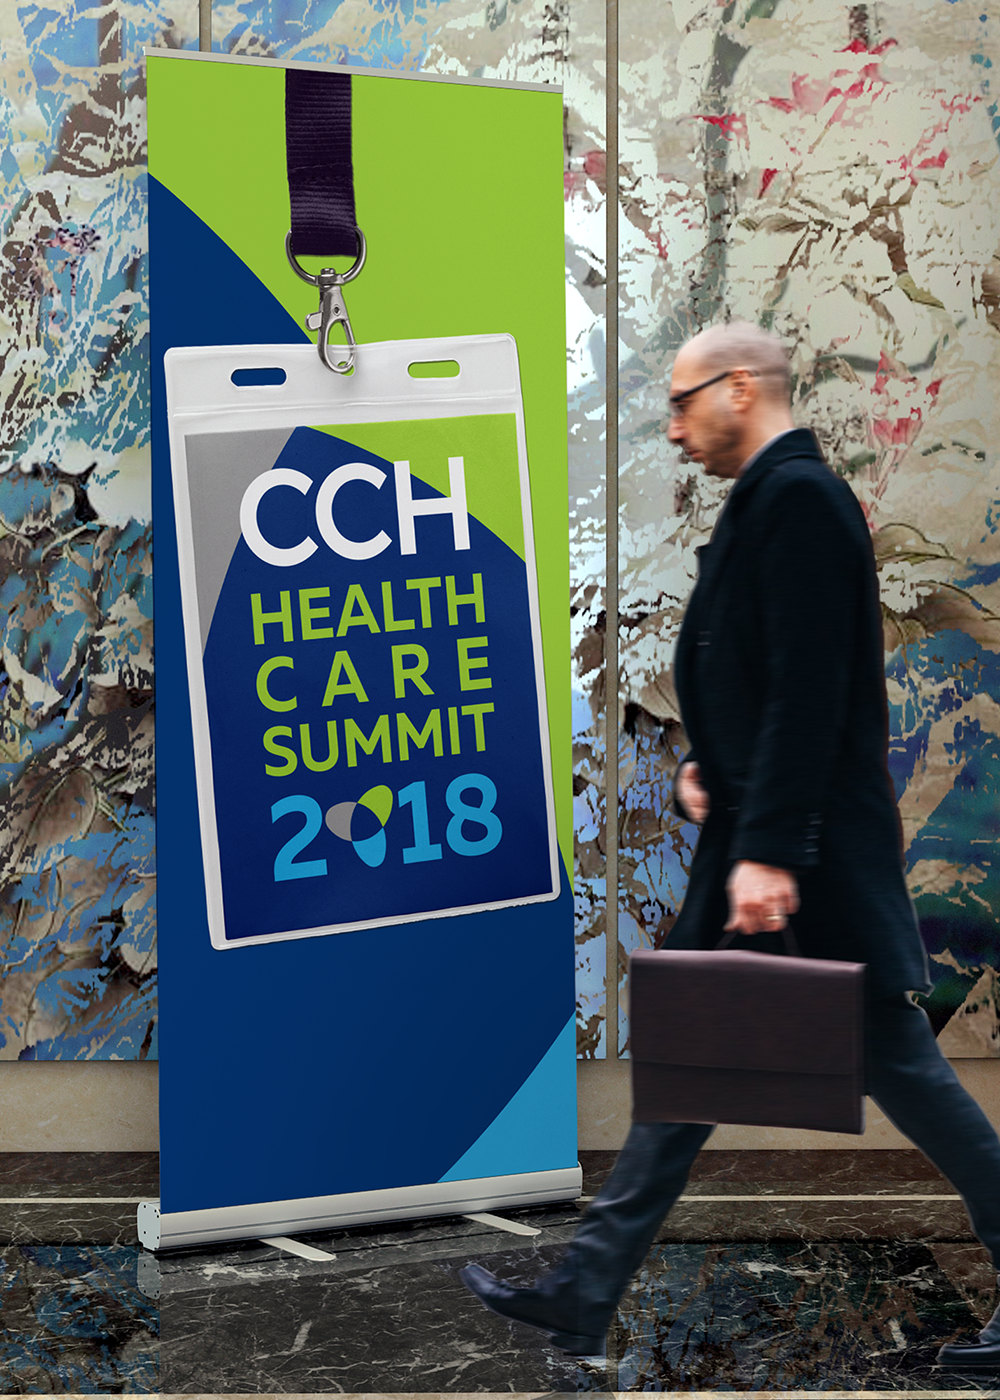 CCH Healthcare Summit - iDesign Branding